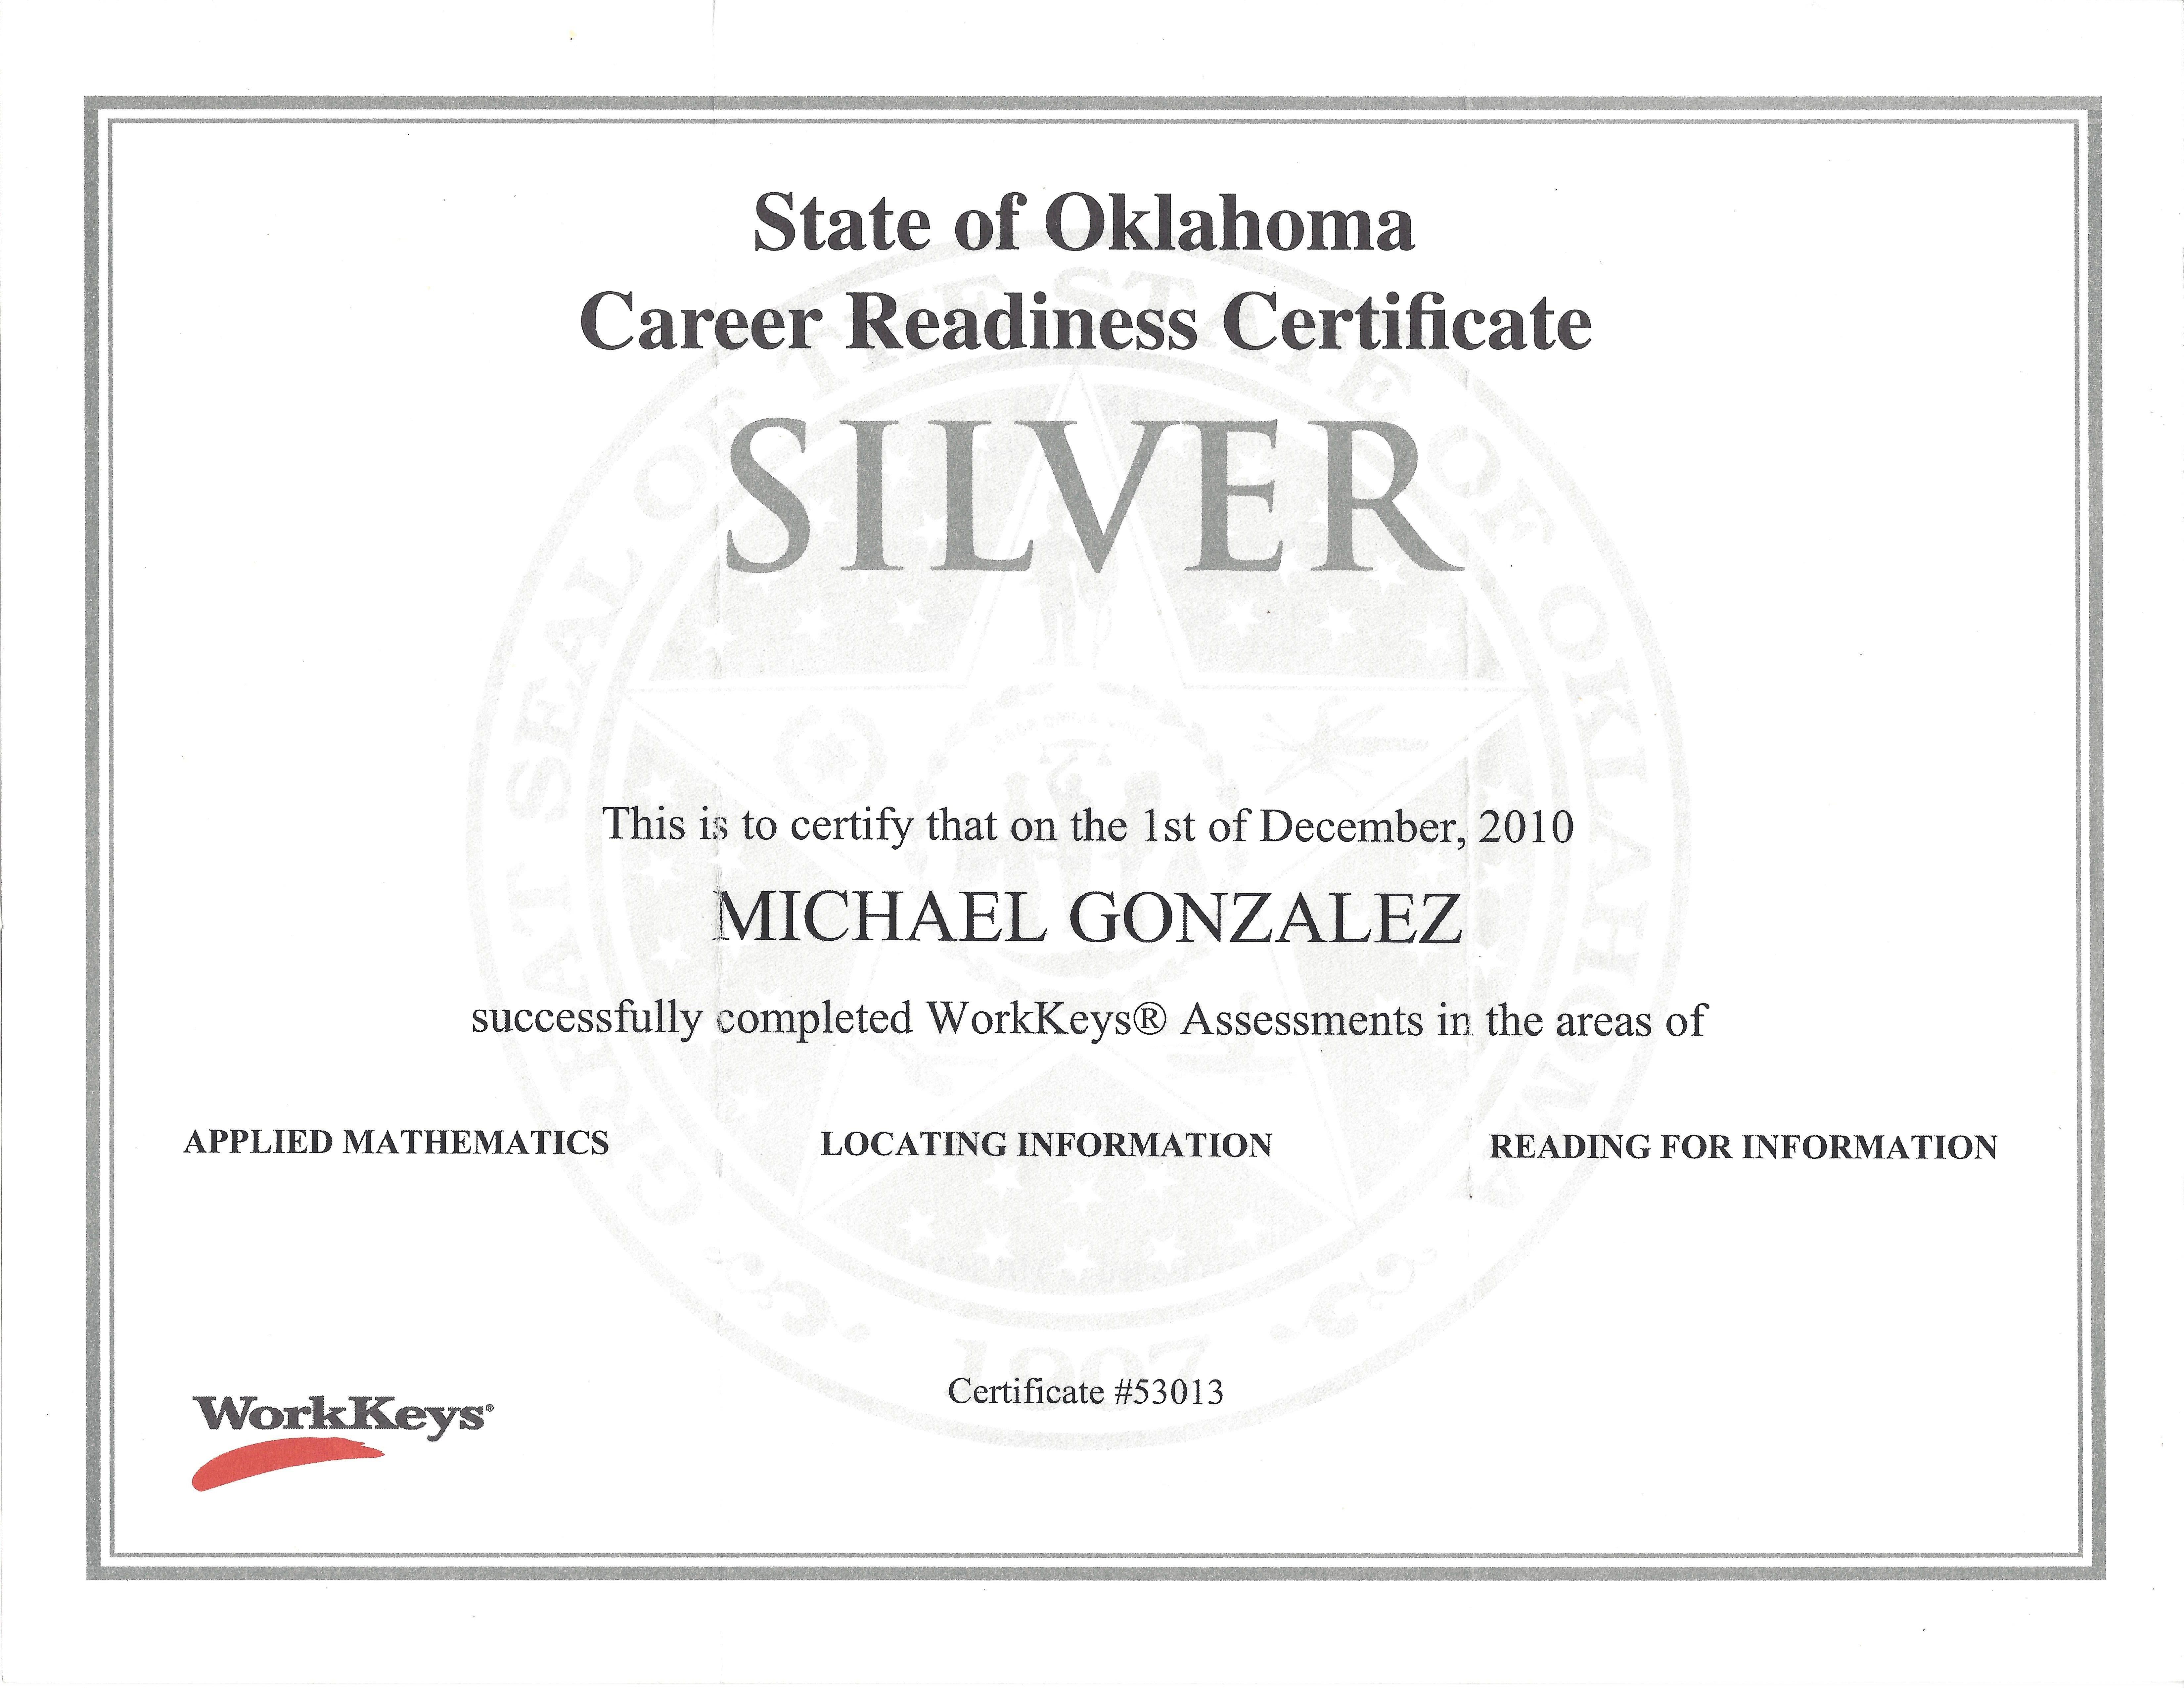 certificate readiness career oklahoma skills related workkeys uploaded user employers identify designed help reading act assessment